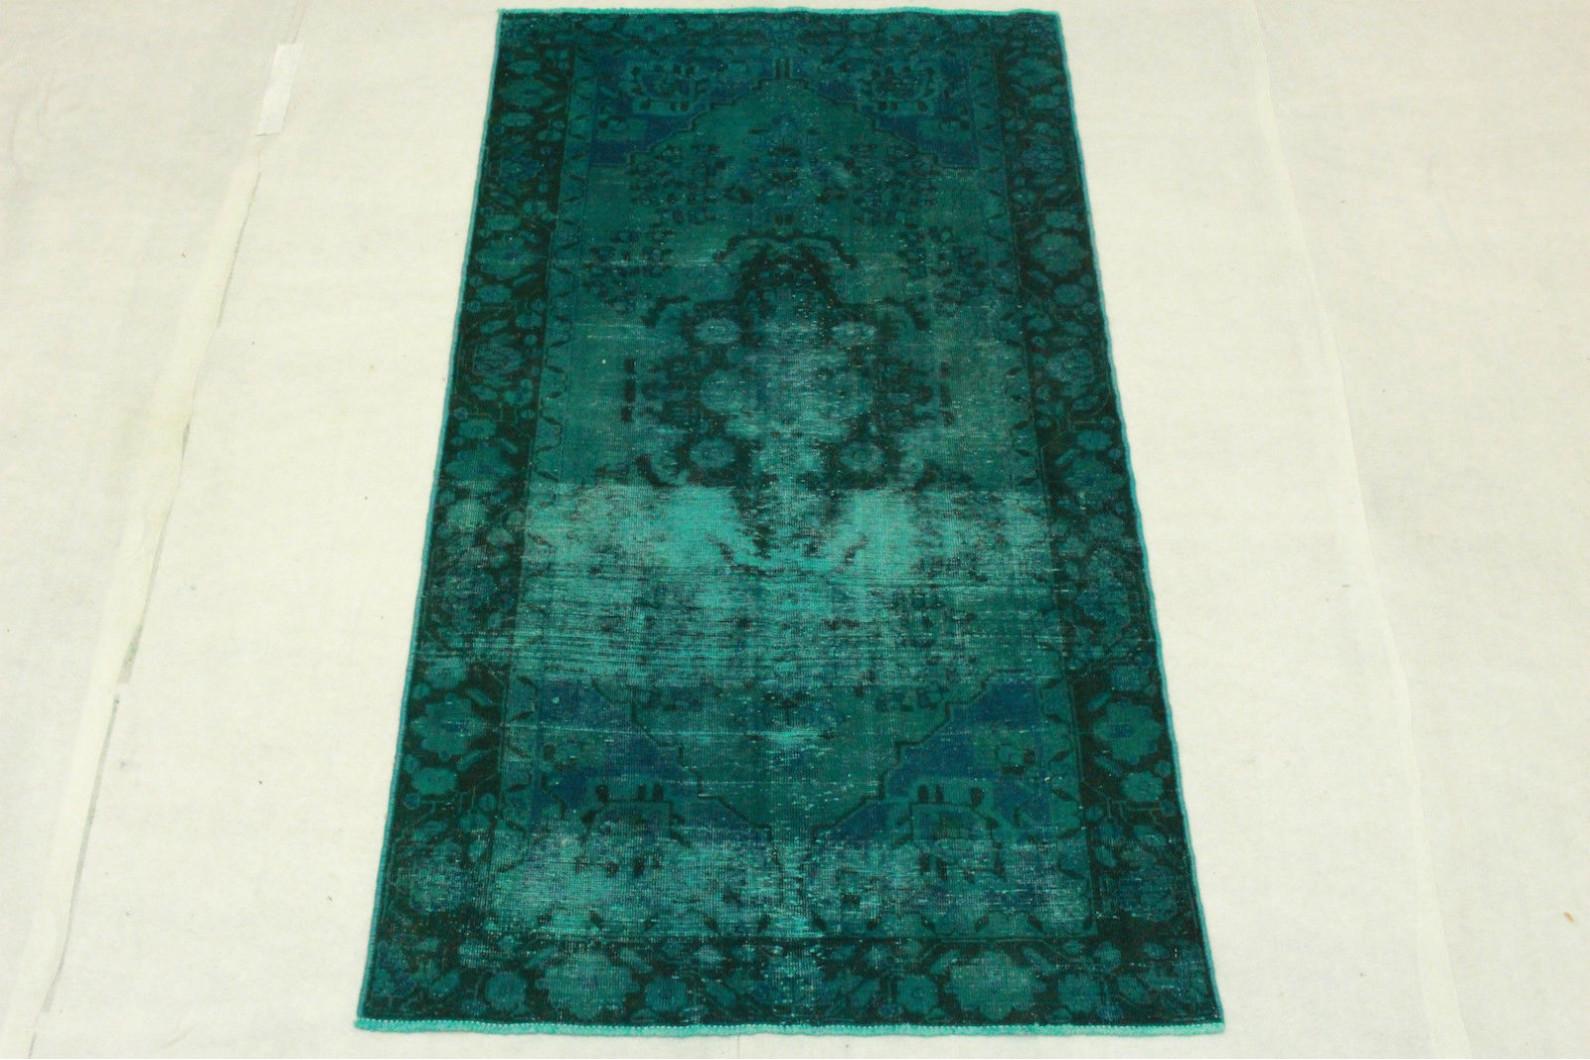 vintage teppich blau t rkis in 220x120cm 1001 3265 bei. Black Bedroom Furniture Sets. Home Design Ideas